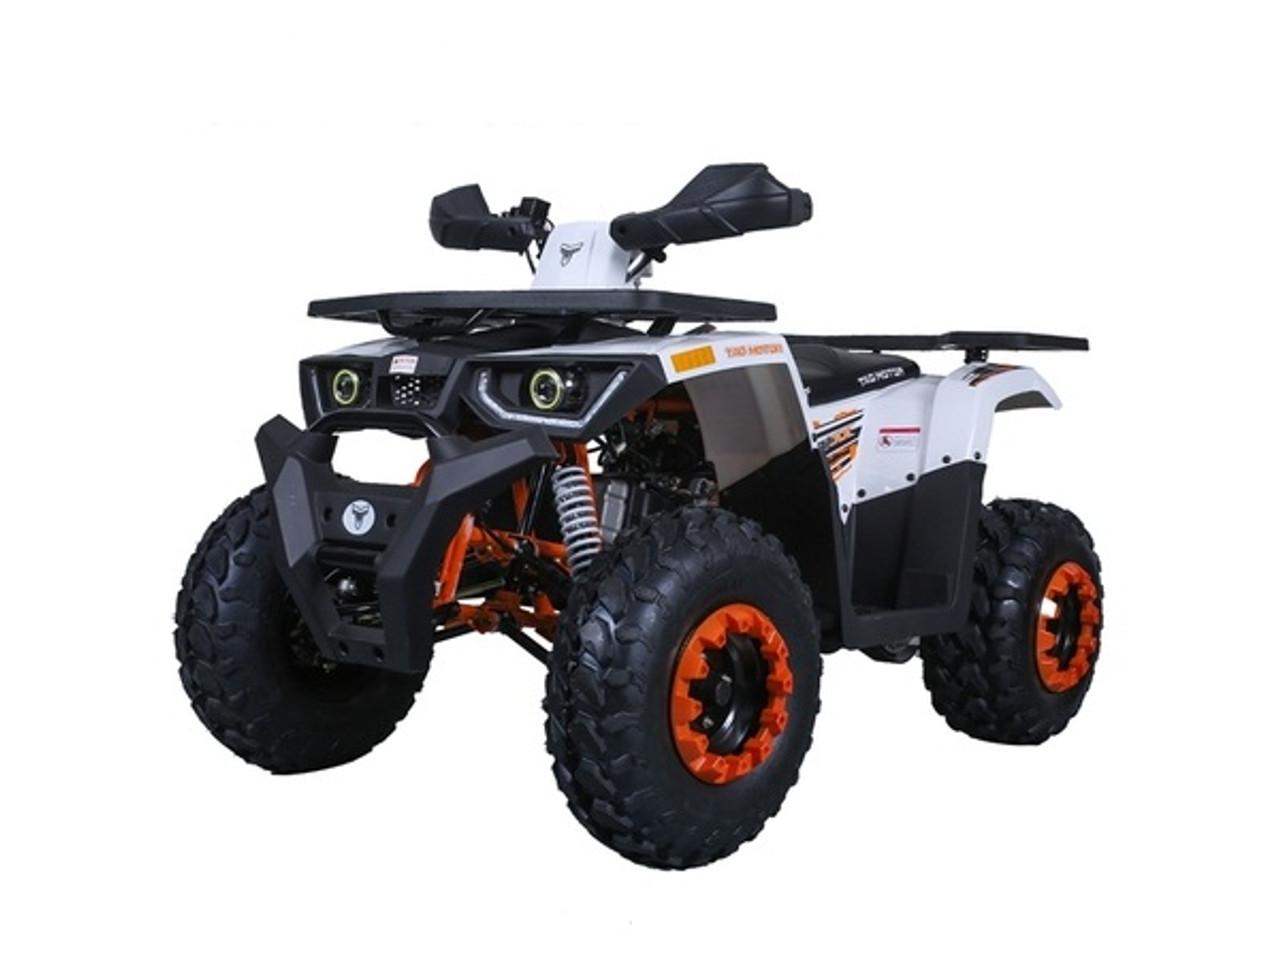 TaoTao Raptor 200 Utility ATV, Air Cooled, 4-Stroke, 1-Cylinder, Automatic